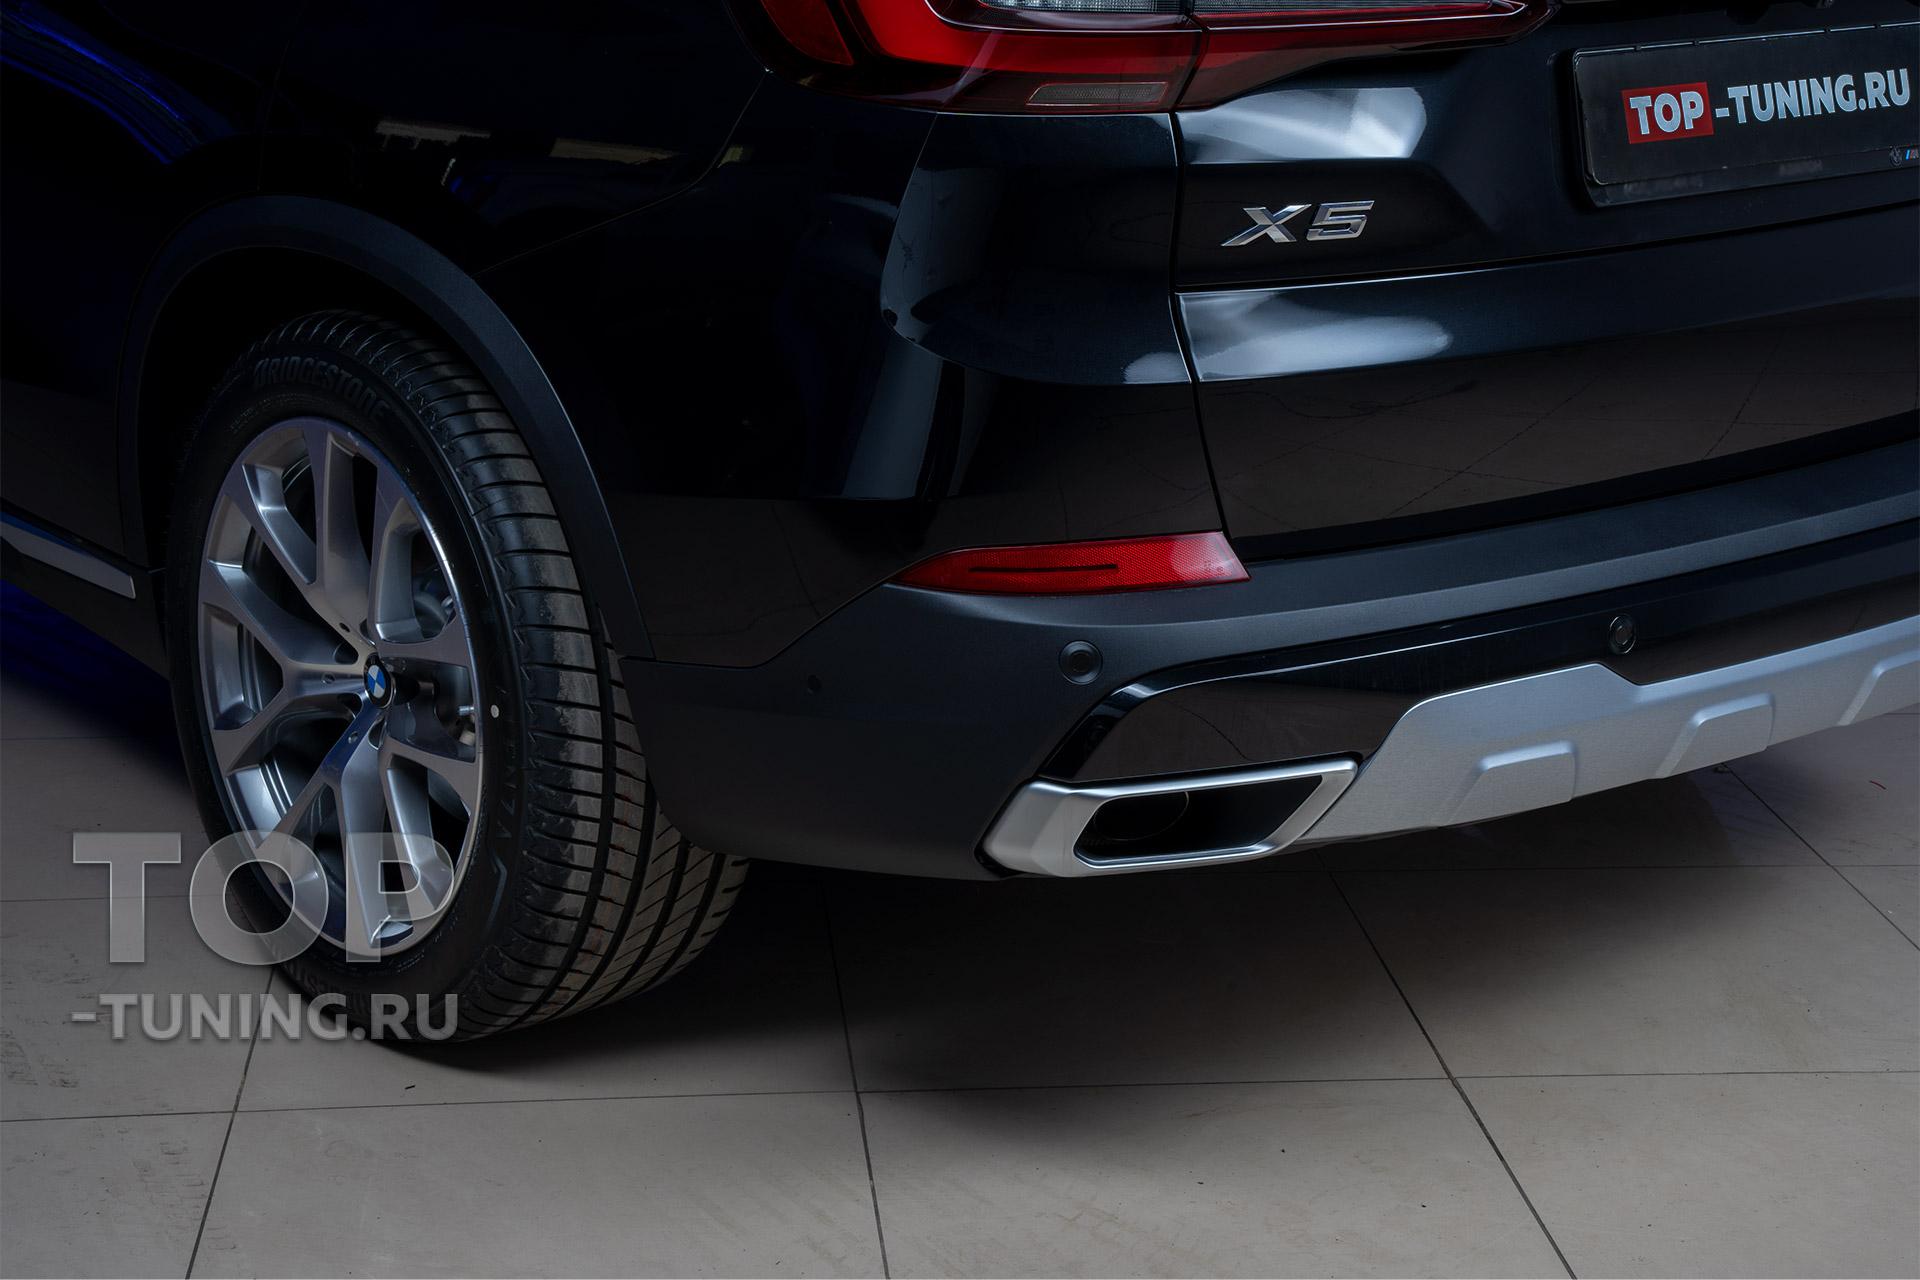 Оклейка пленкой BMW X5 G05 – весь кузов. PPF STEK Dyno Shield